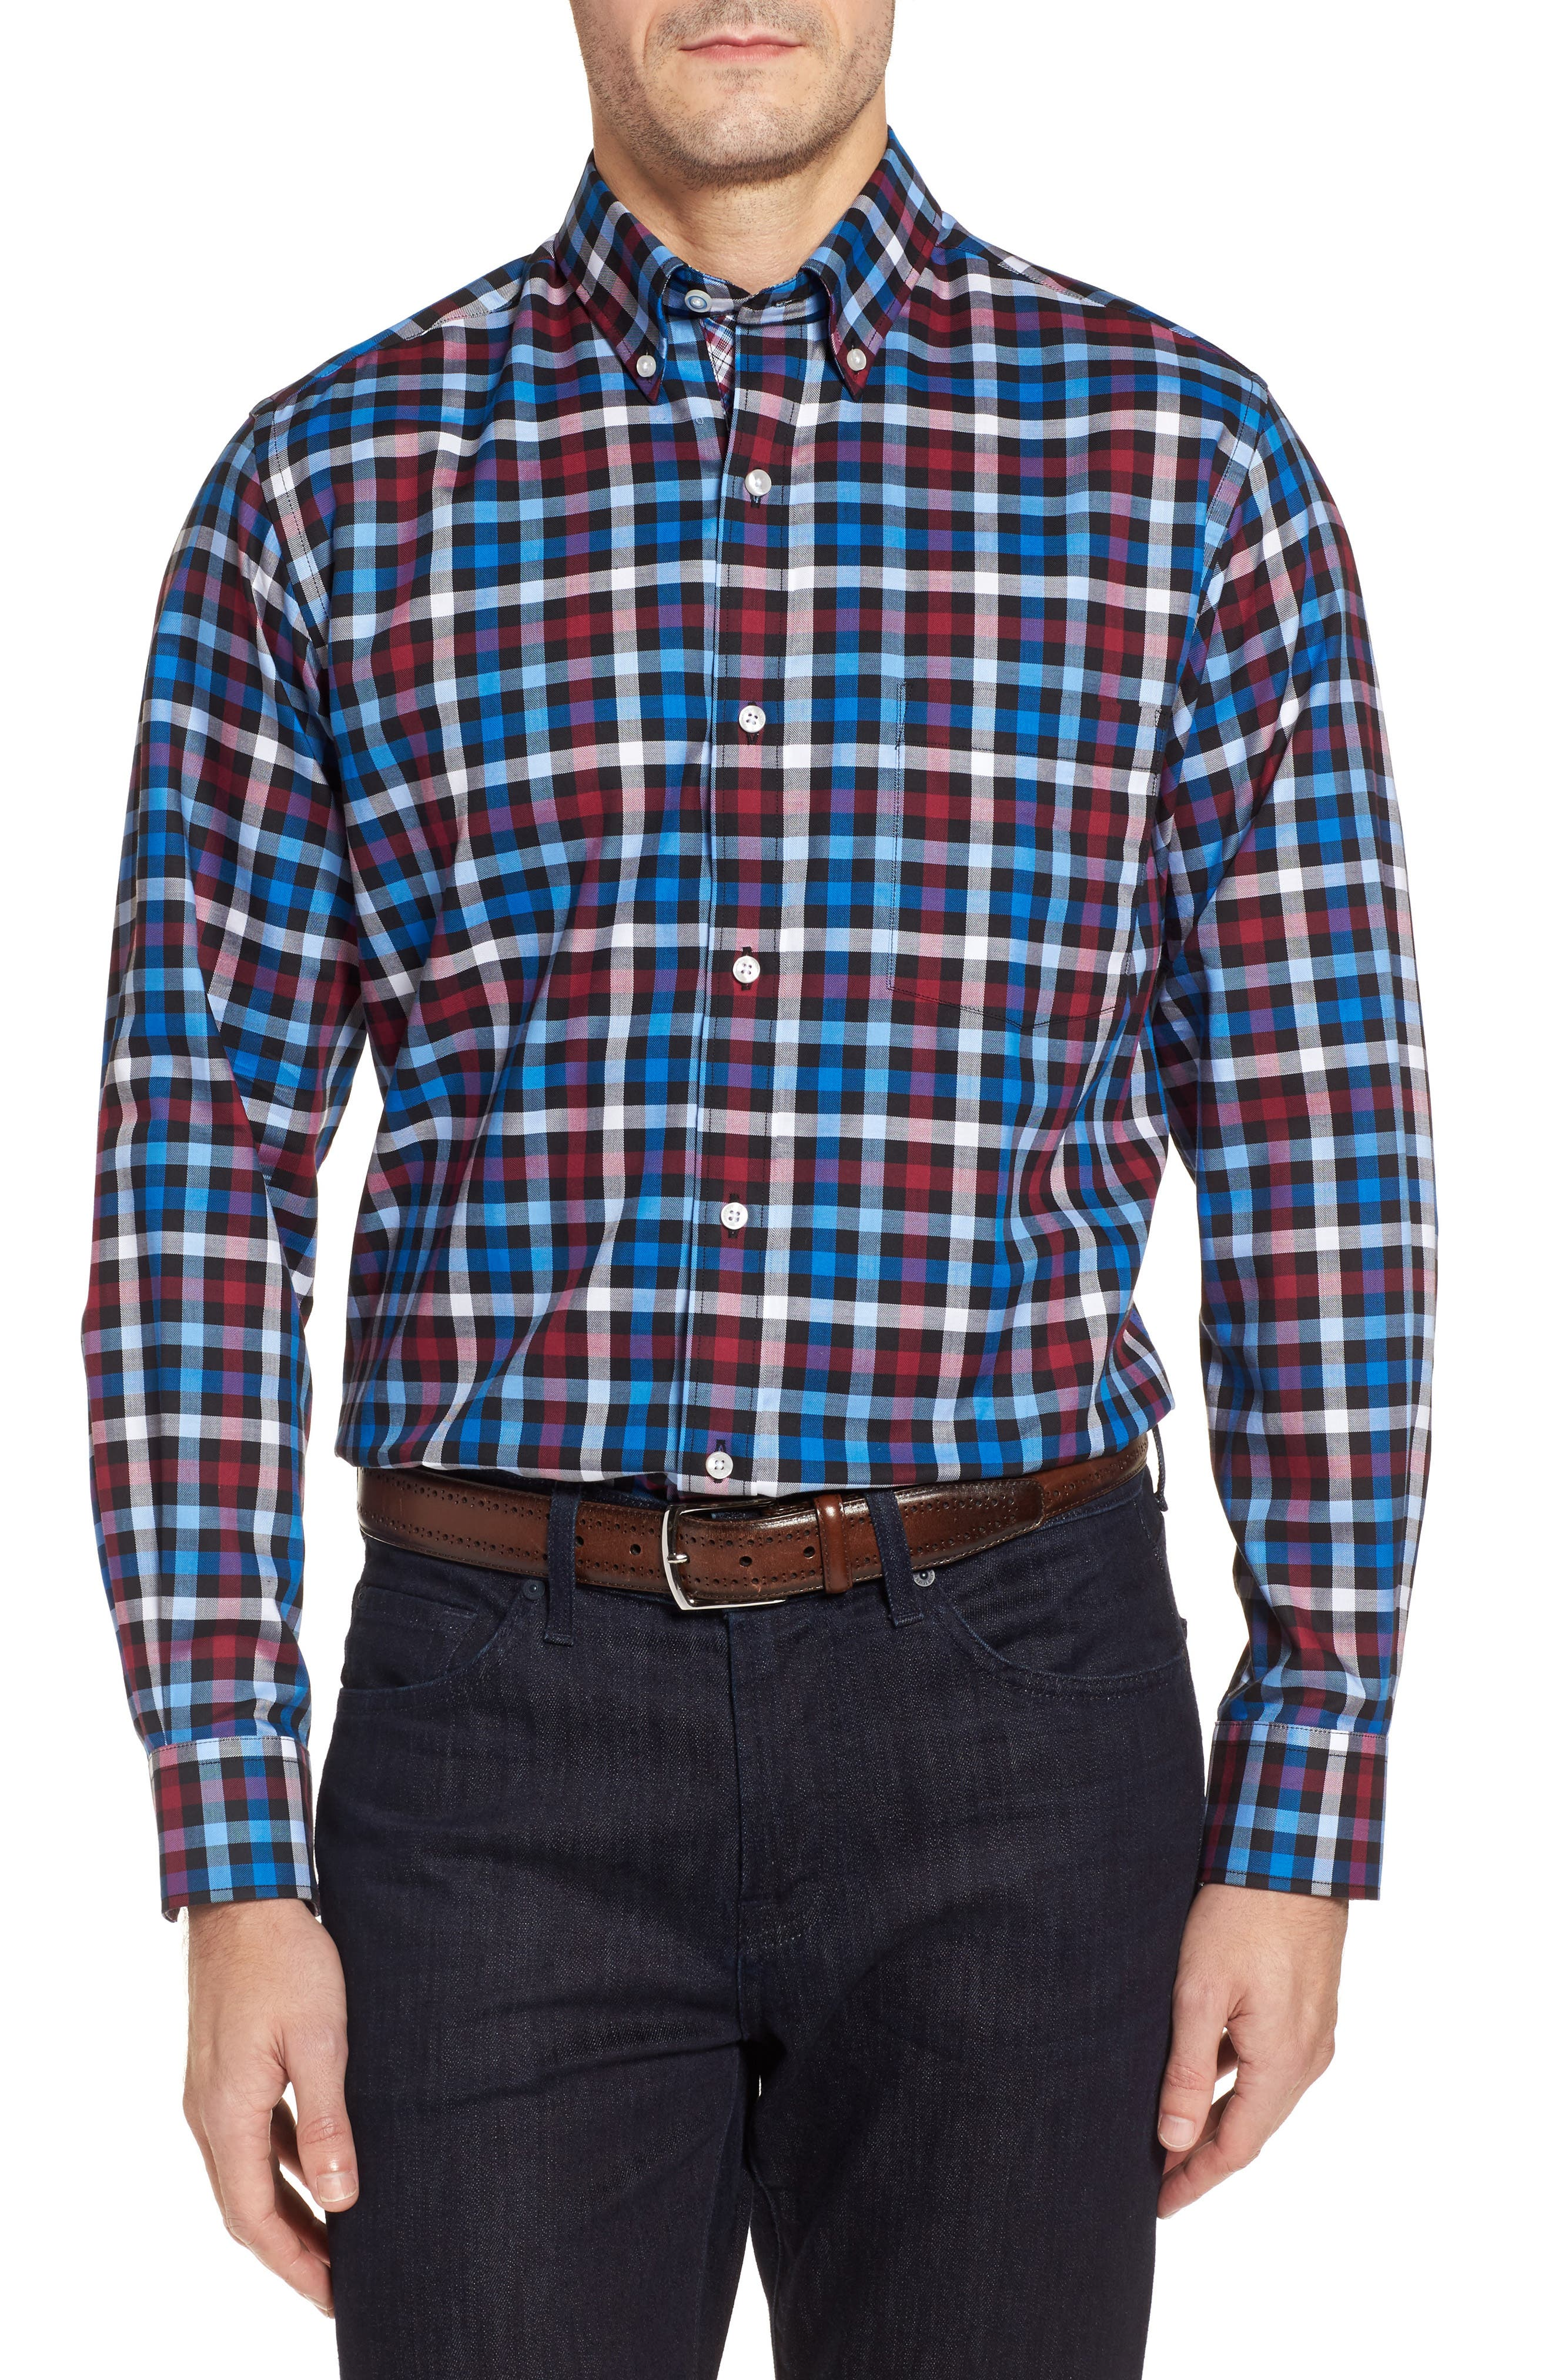 Main Image - TailorByrd Brusly Regular Fit Gingham Sport Shirt